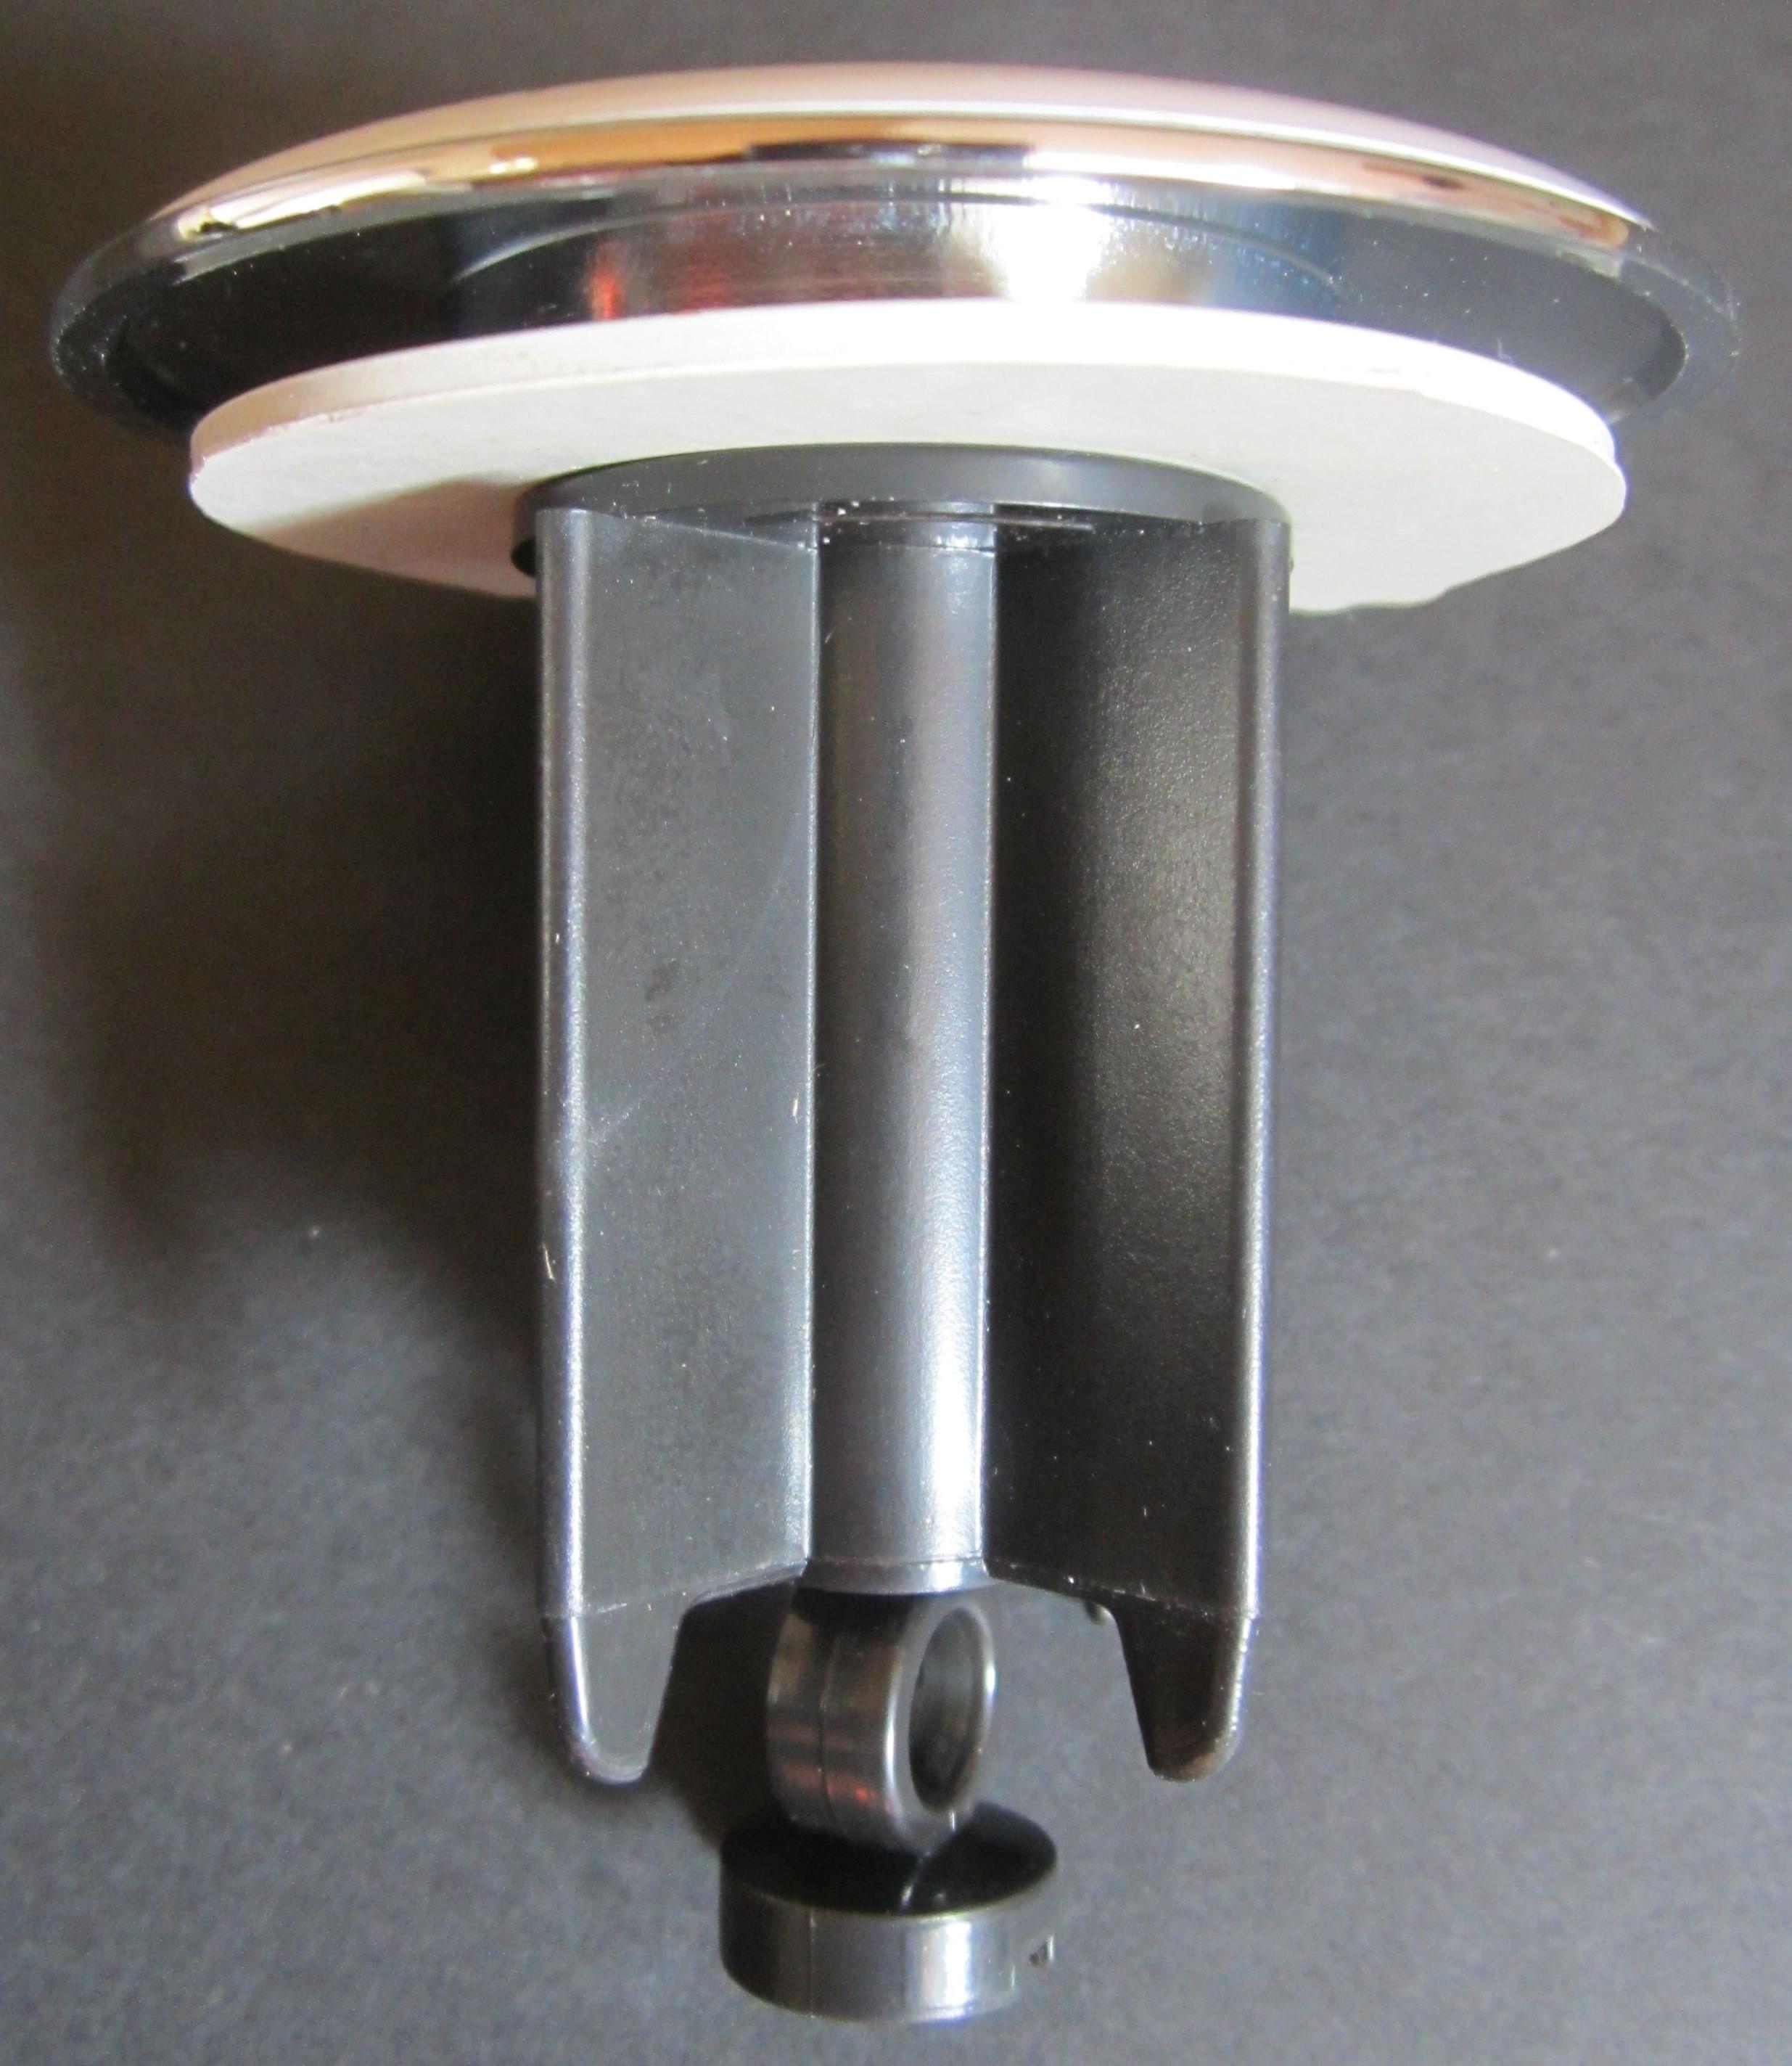 Waschbecken-Stöpsel Waschbeckenstöpsel Stöpsel Bad Küche WC Abfluss-Stöpsel